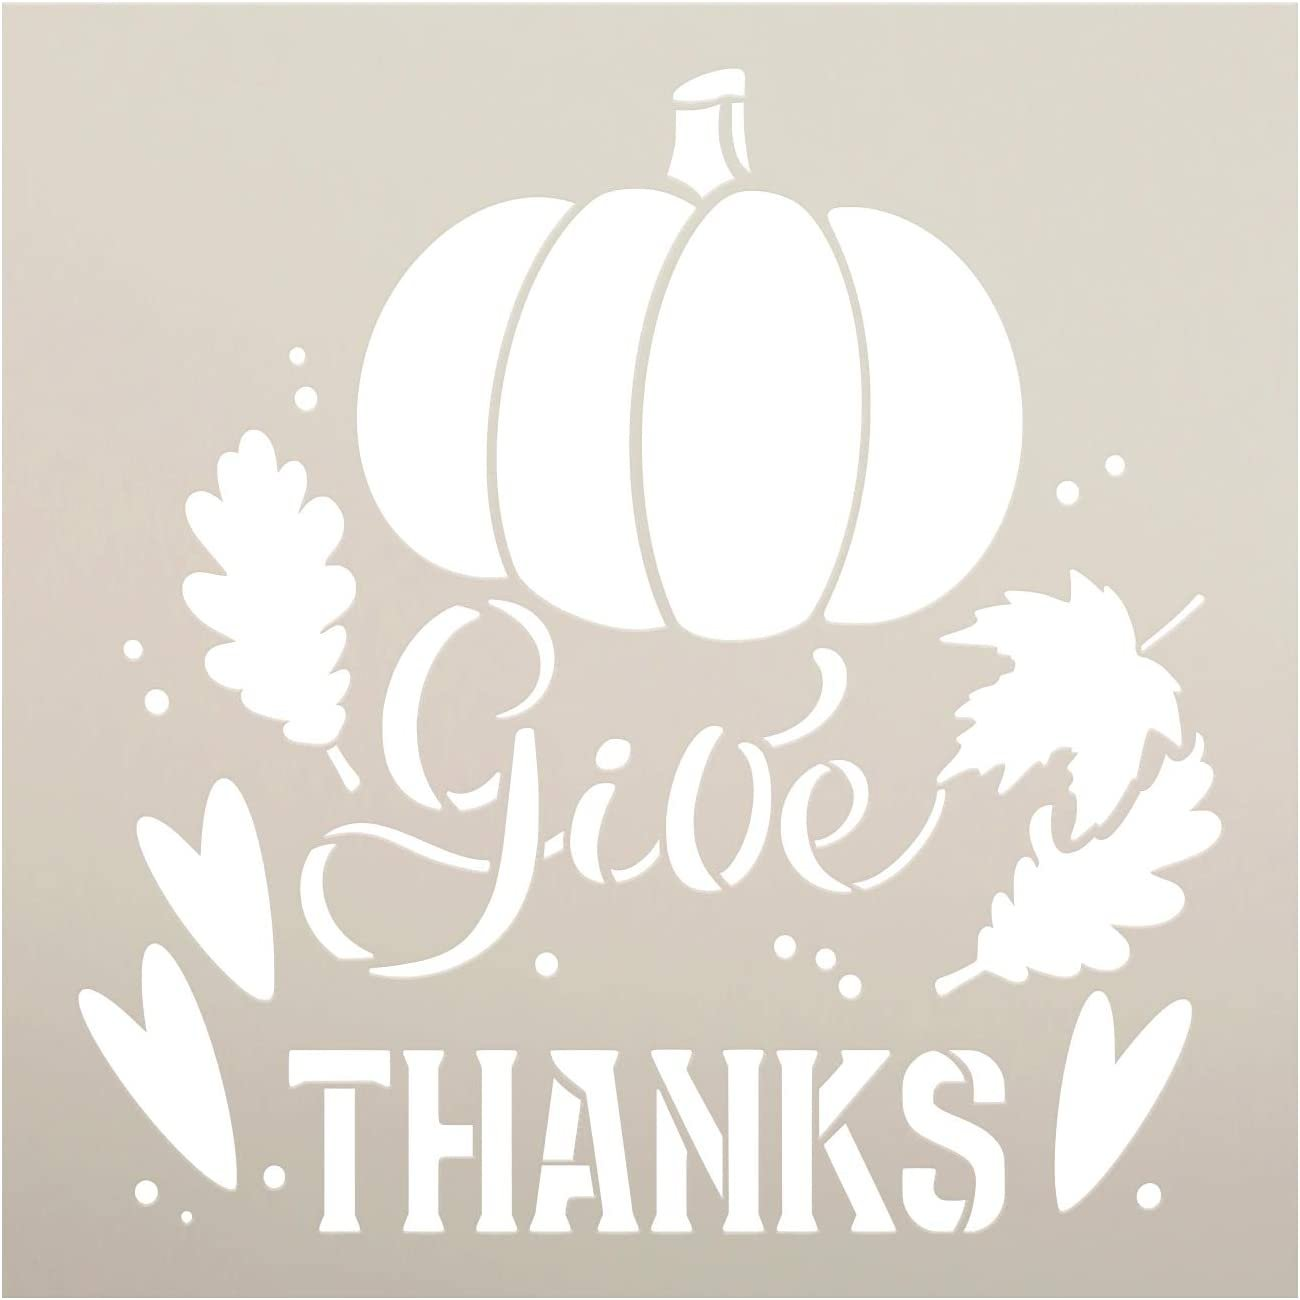 Give Thanks Stencil By Studior12 Diy Autumn Farmhouse Home Decor Craft Paint Wood Sign Reusable Mylar Template Pumpkin Leaves Cursive Script Gift Select Size Creative Arts Lifestyle